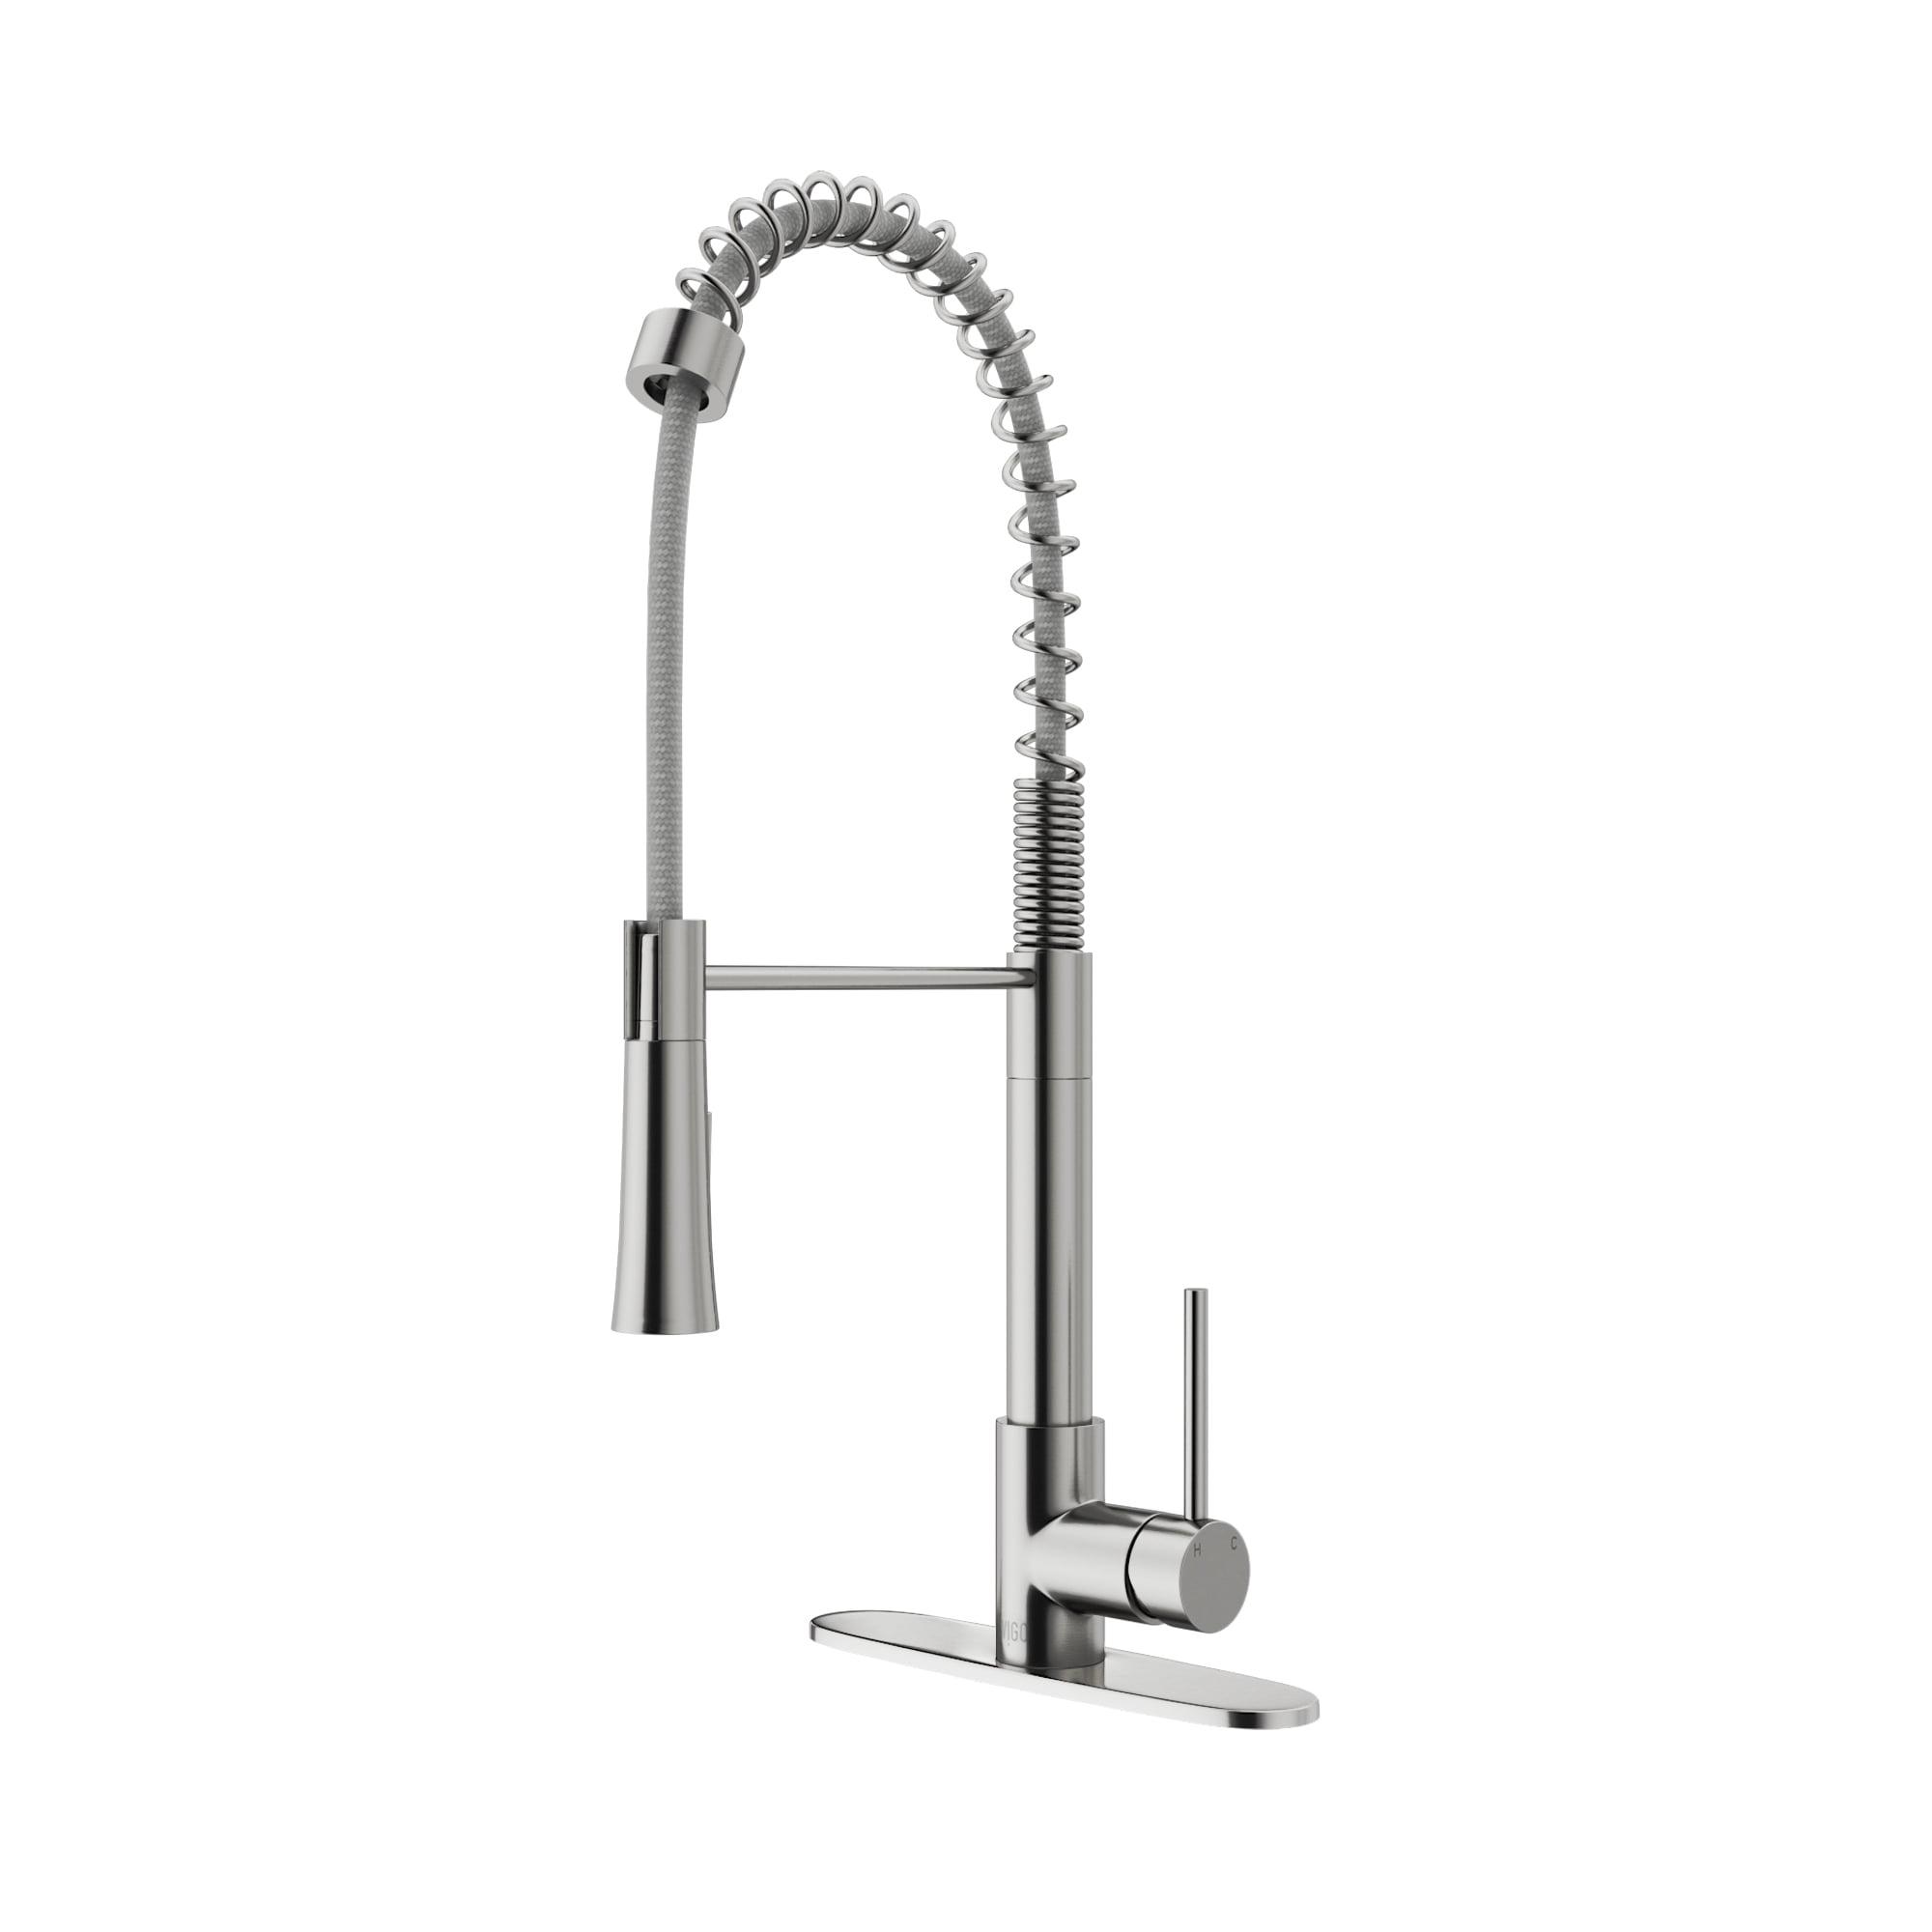 Vigo Laurelton Pull Down Spray Kitchen Faucet In Matte Black vigo laurelton stainless steel pull-down spray kitchen